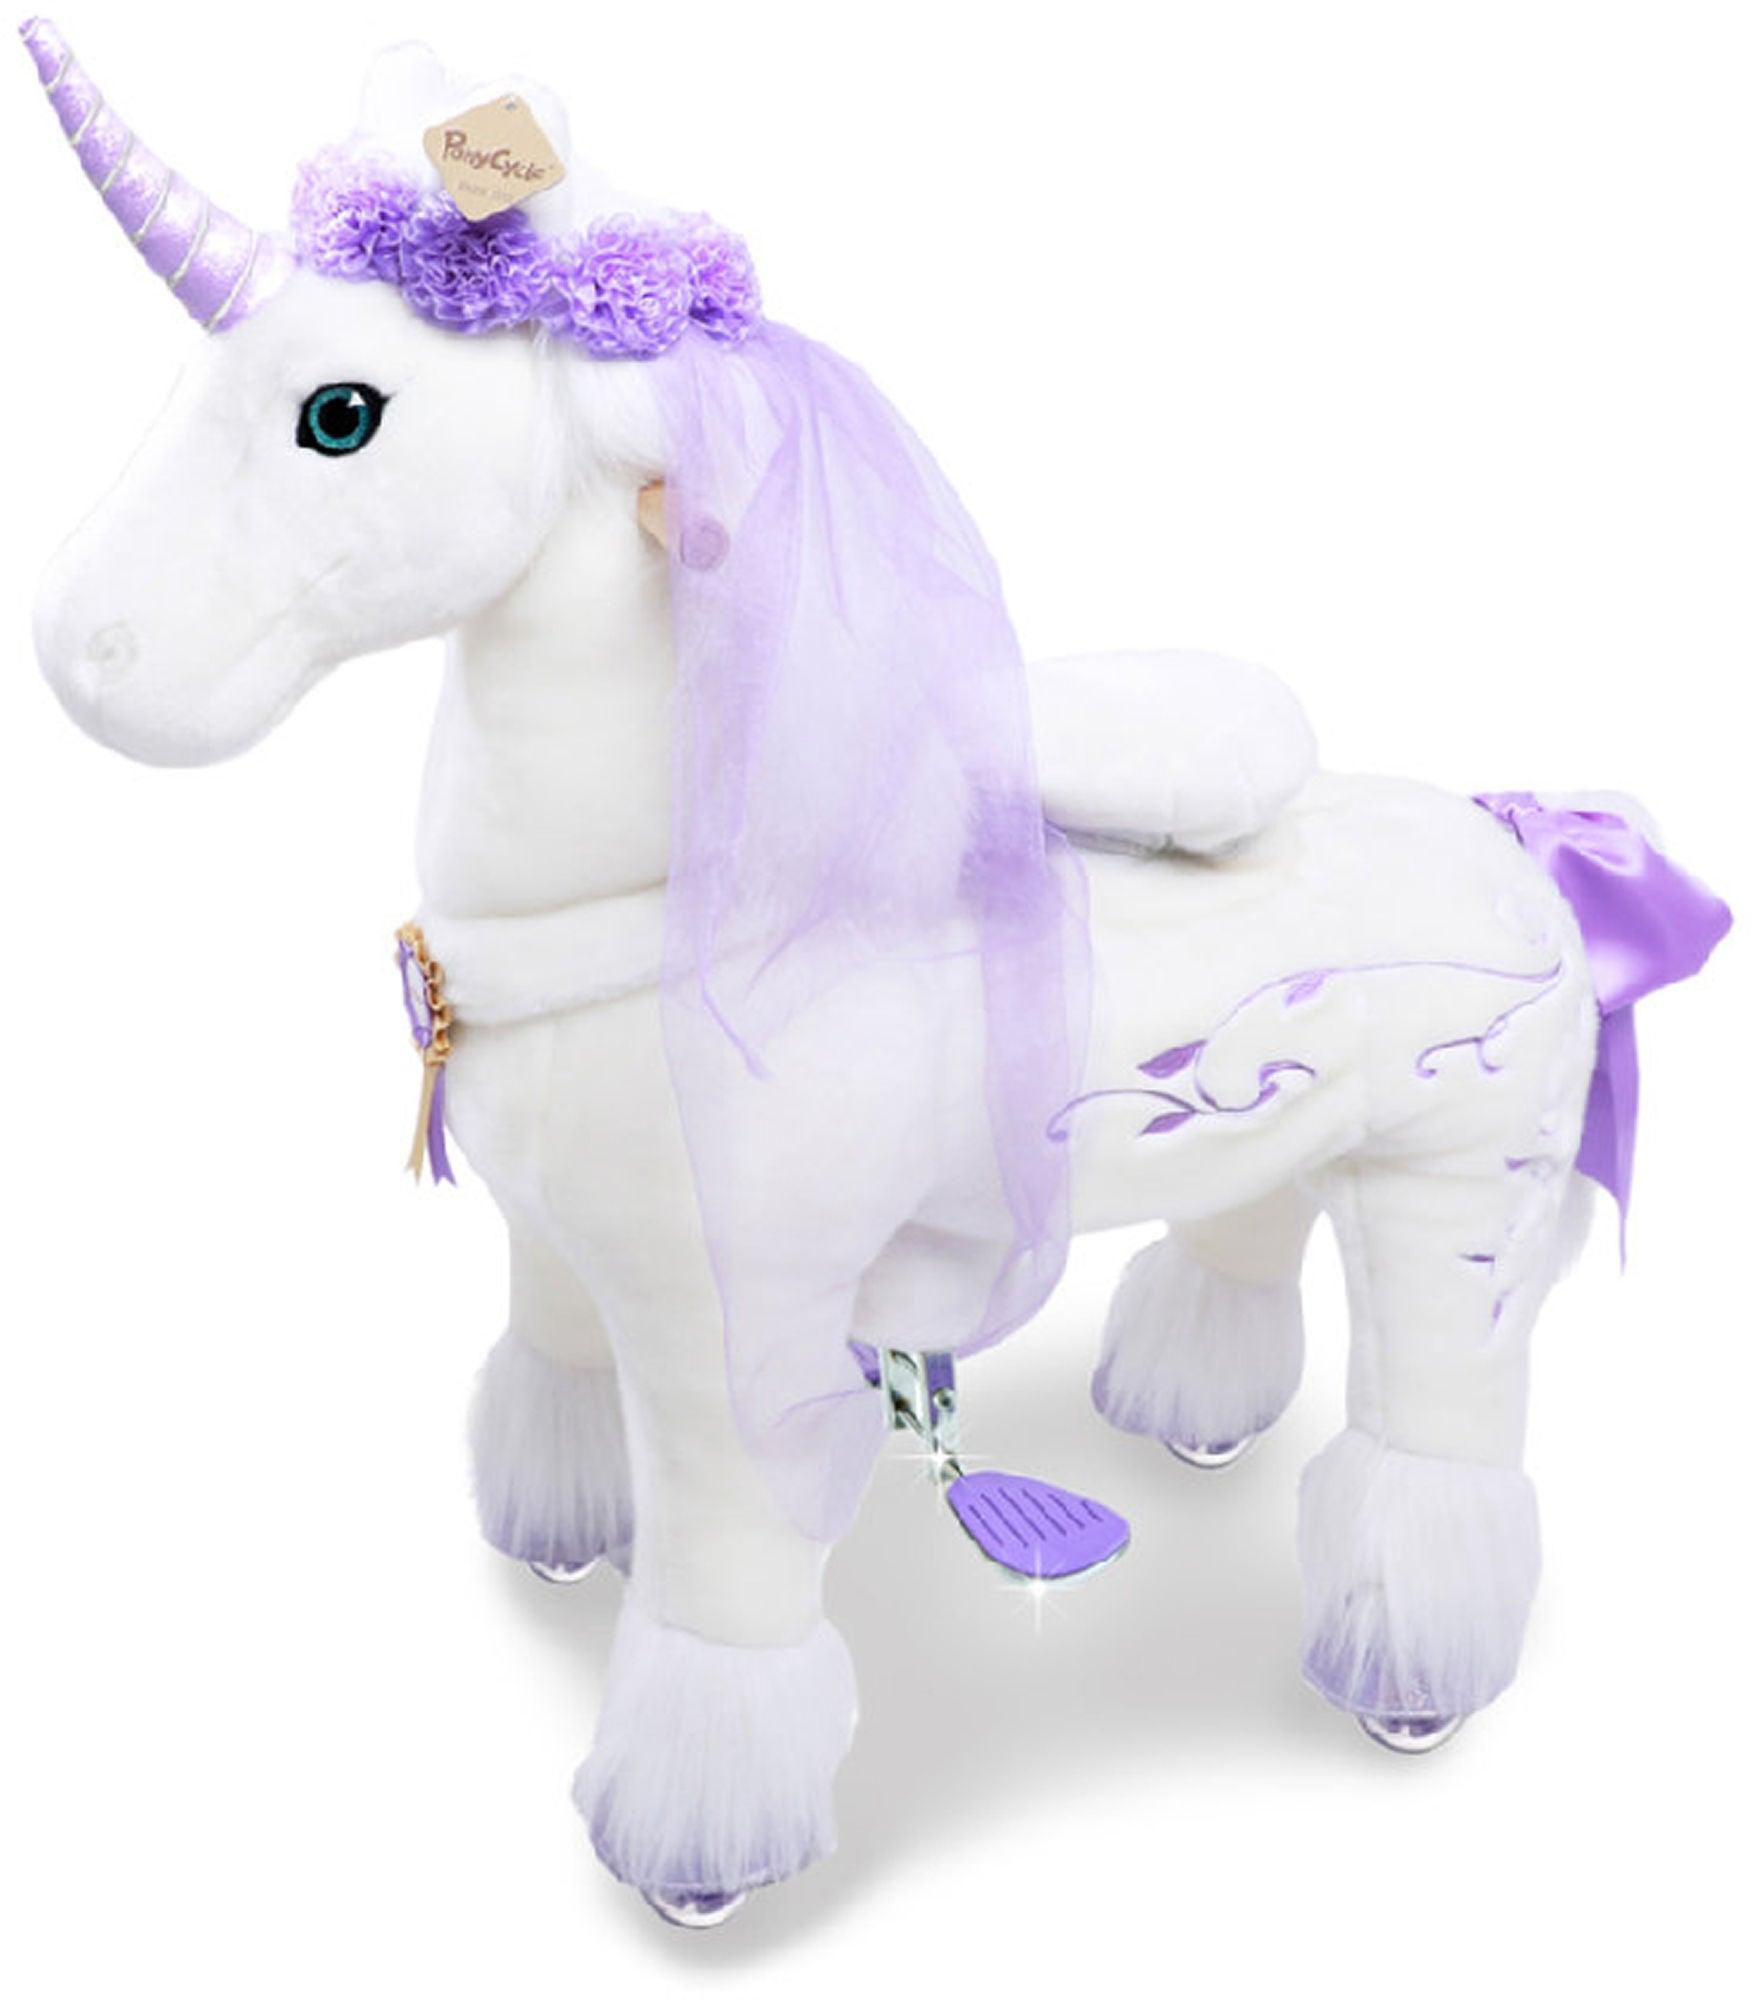 PonyCycle Ride-On Häst Premium Stor, Vit